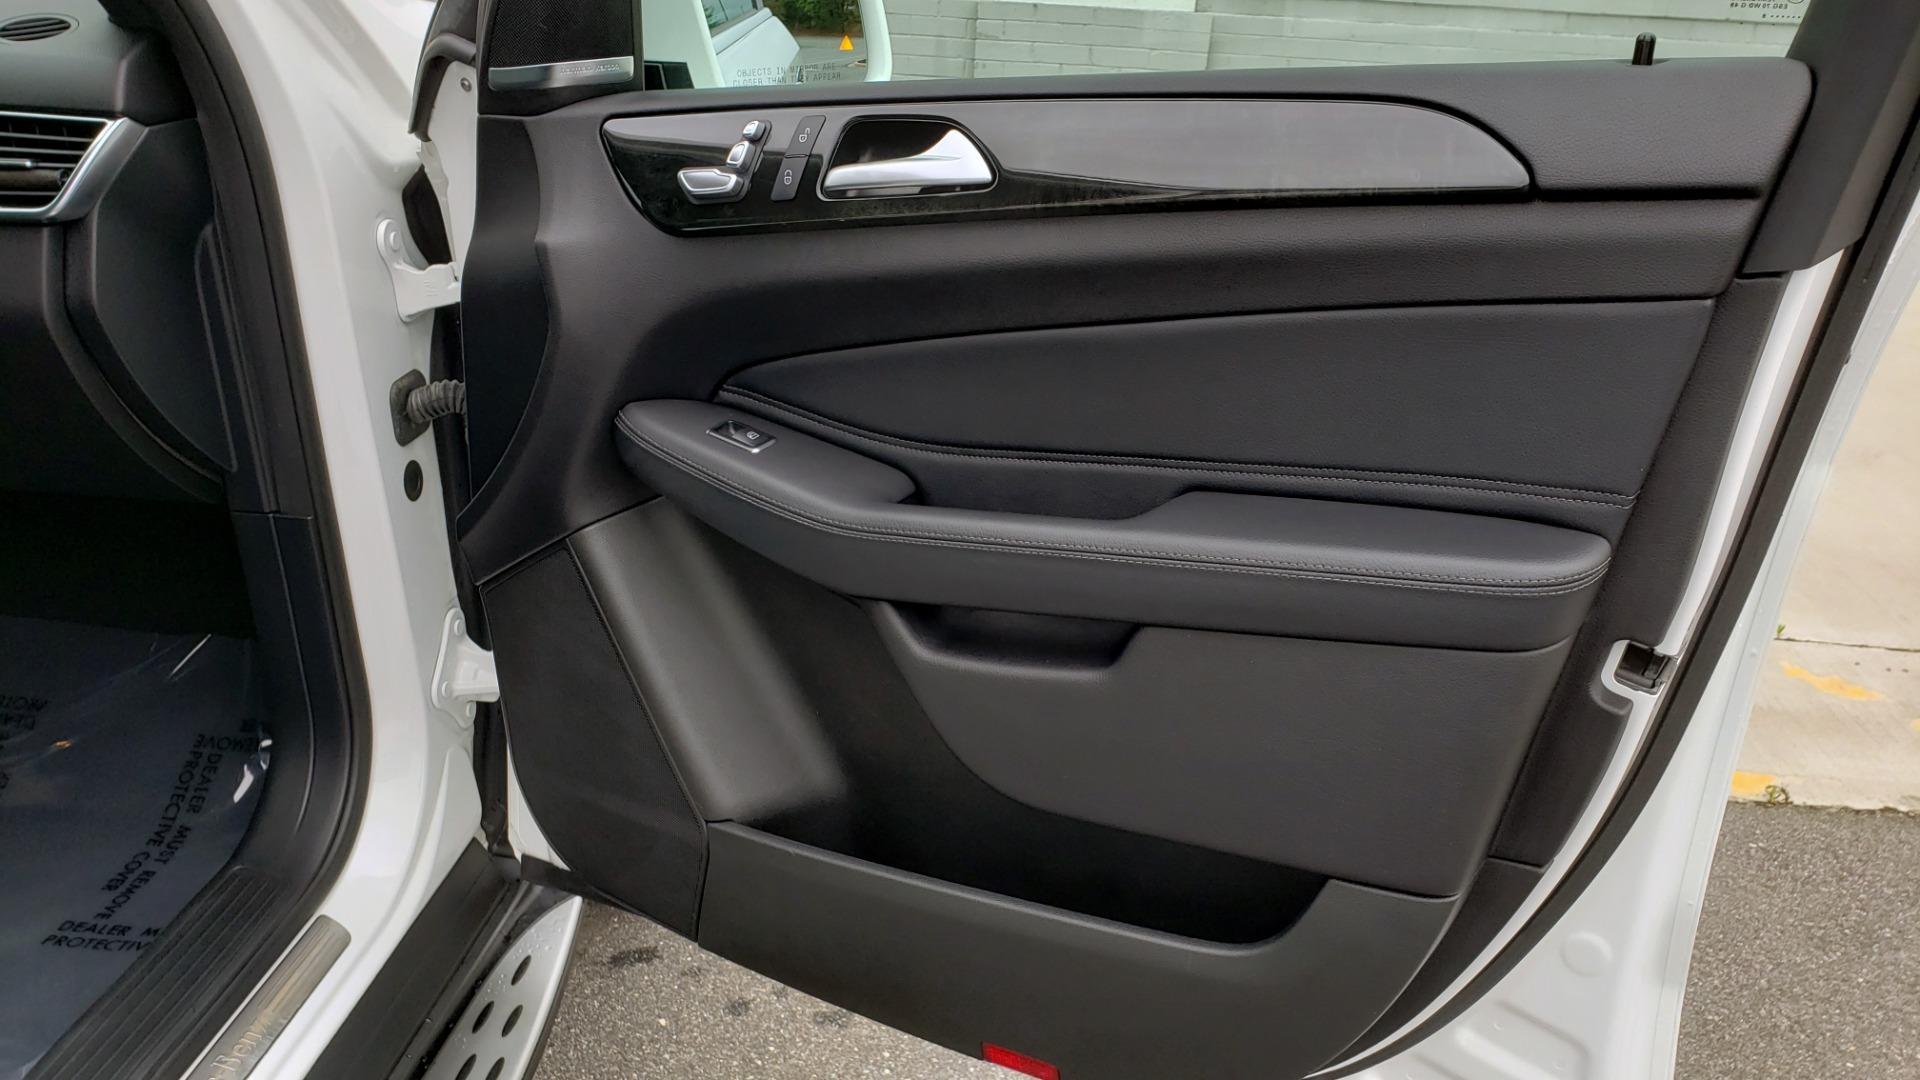 Used 2018 Mercedes-Benz GLE 350 4MATIC / PREM PKG / NAV / PARK ASST / K/H SND / HITCH / REARVIEW for sale $40,801 at Formula Imports in Charlotte NC 28227 67